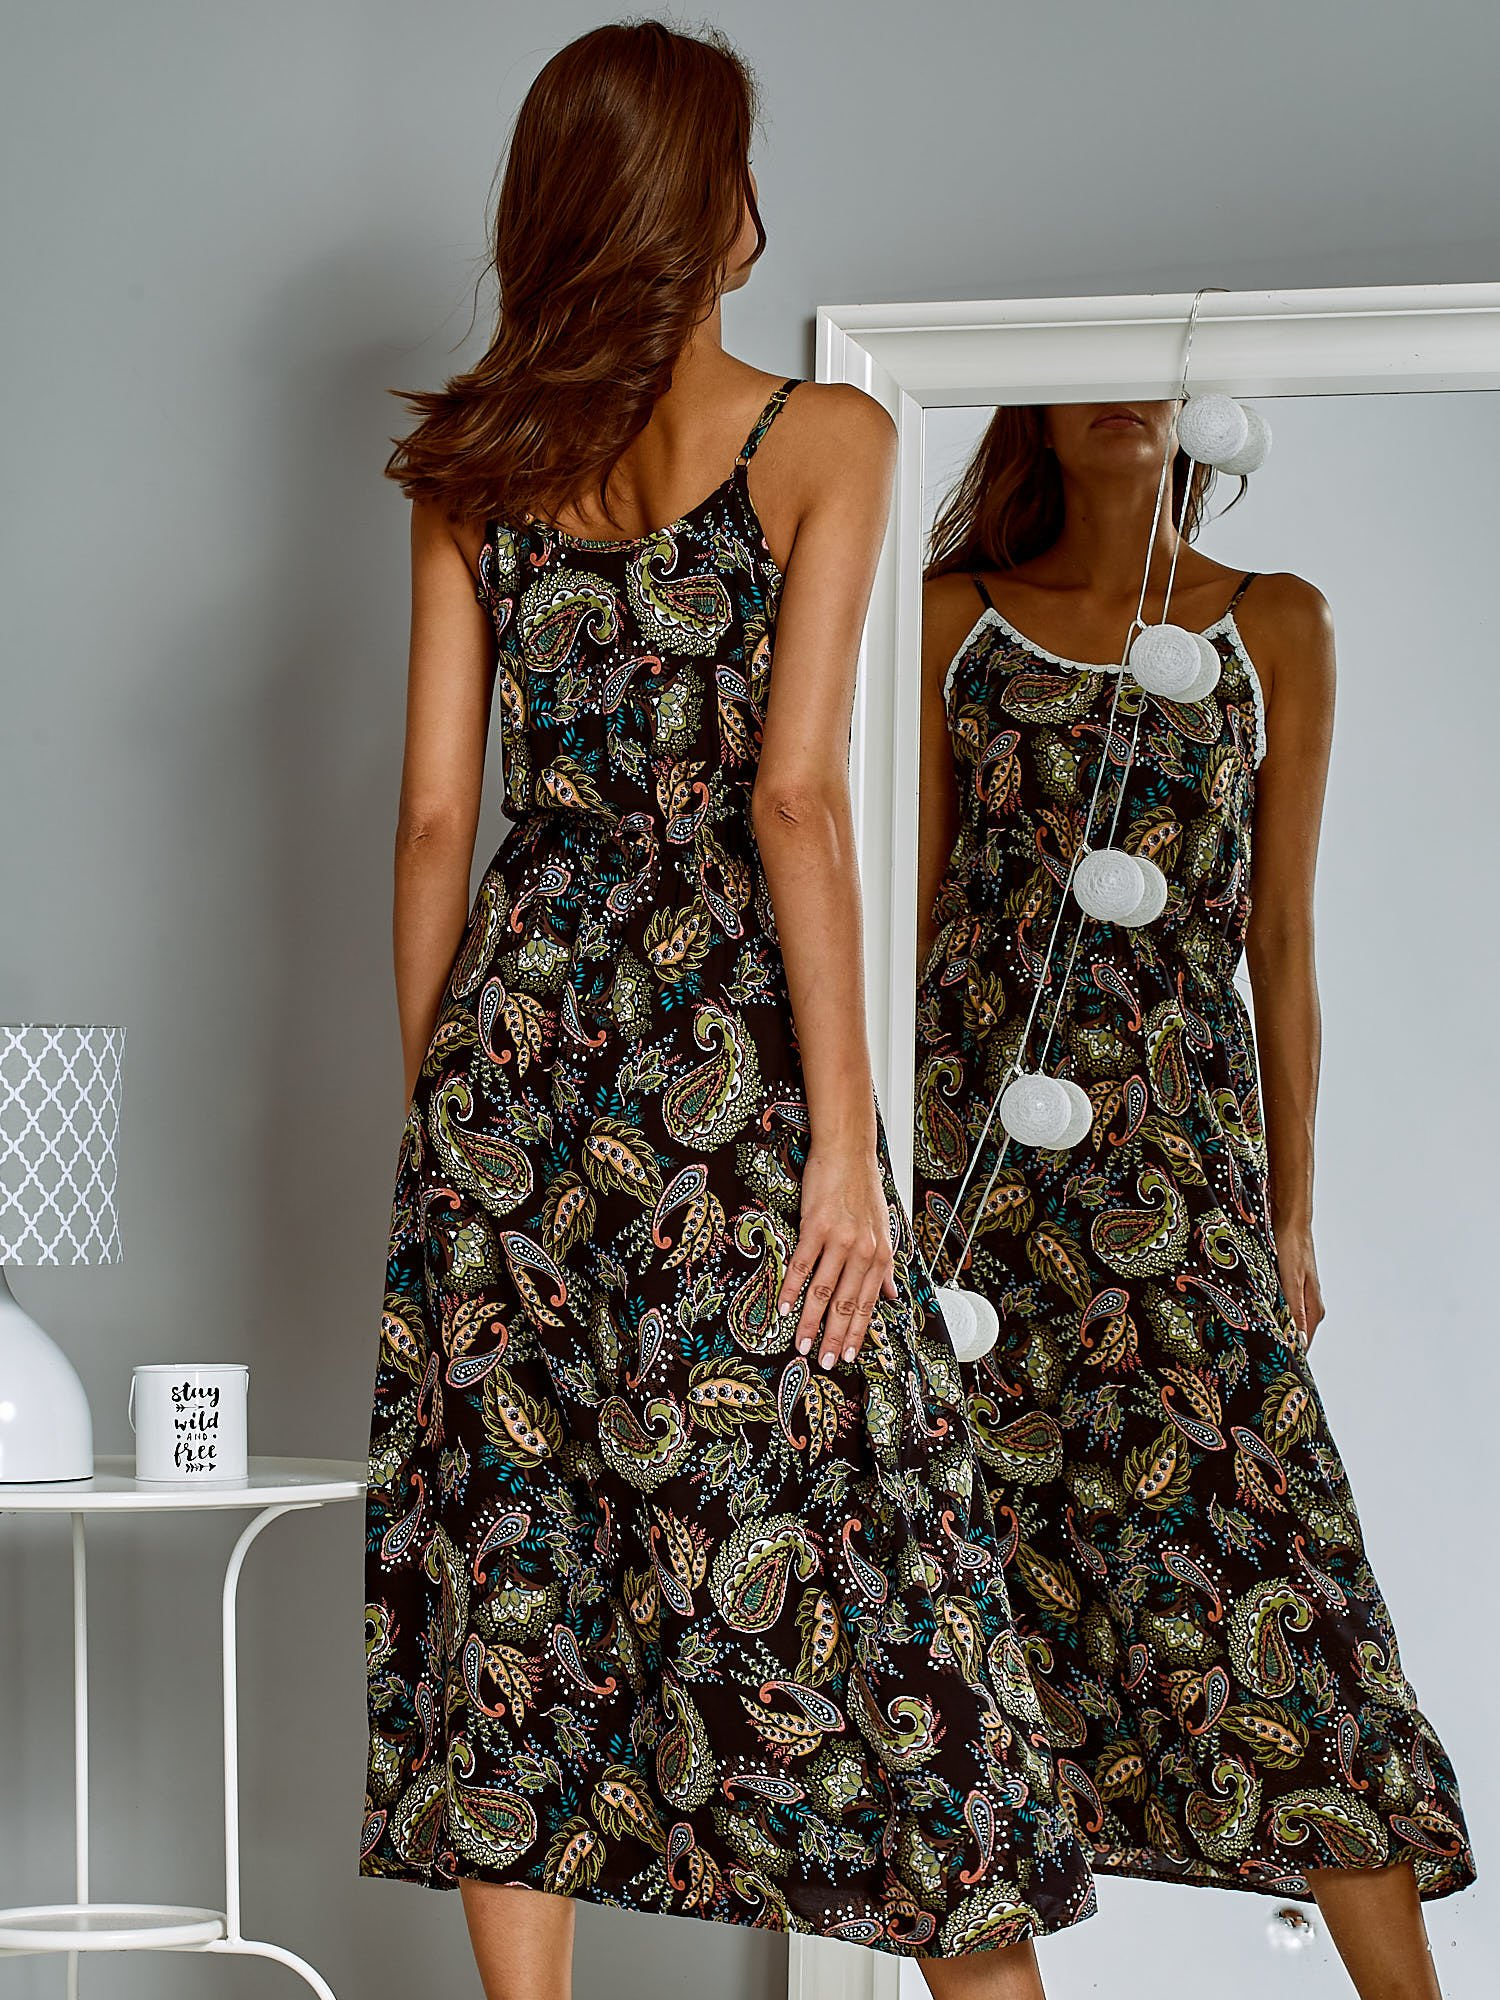 7e943ac7c3 Letnia sukienka maxi z nadrukiem paisley czarna - Sukienka na wesele -  sklep eButik.pl